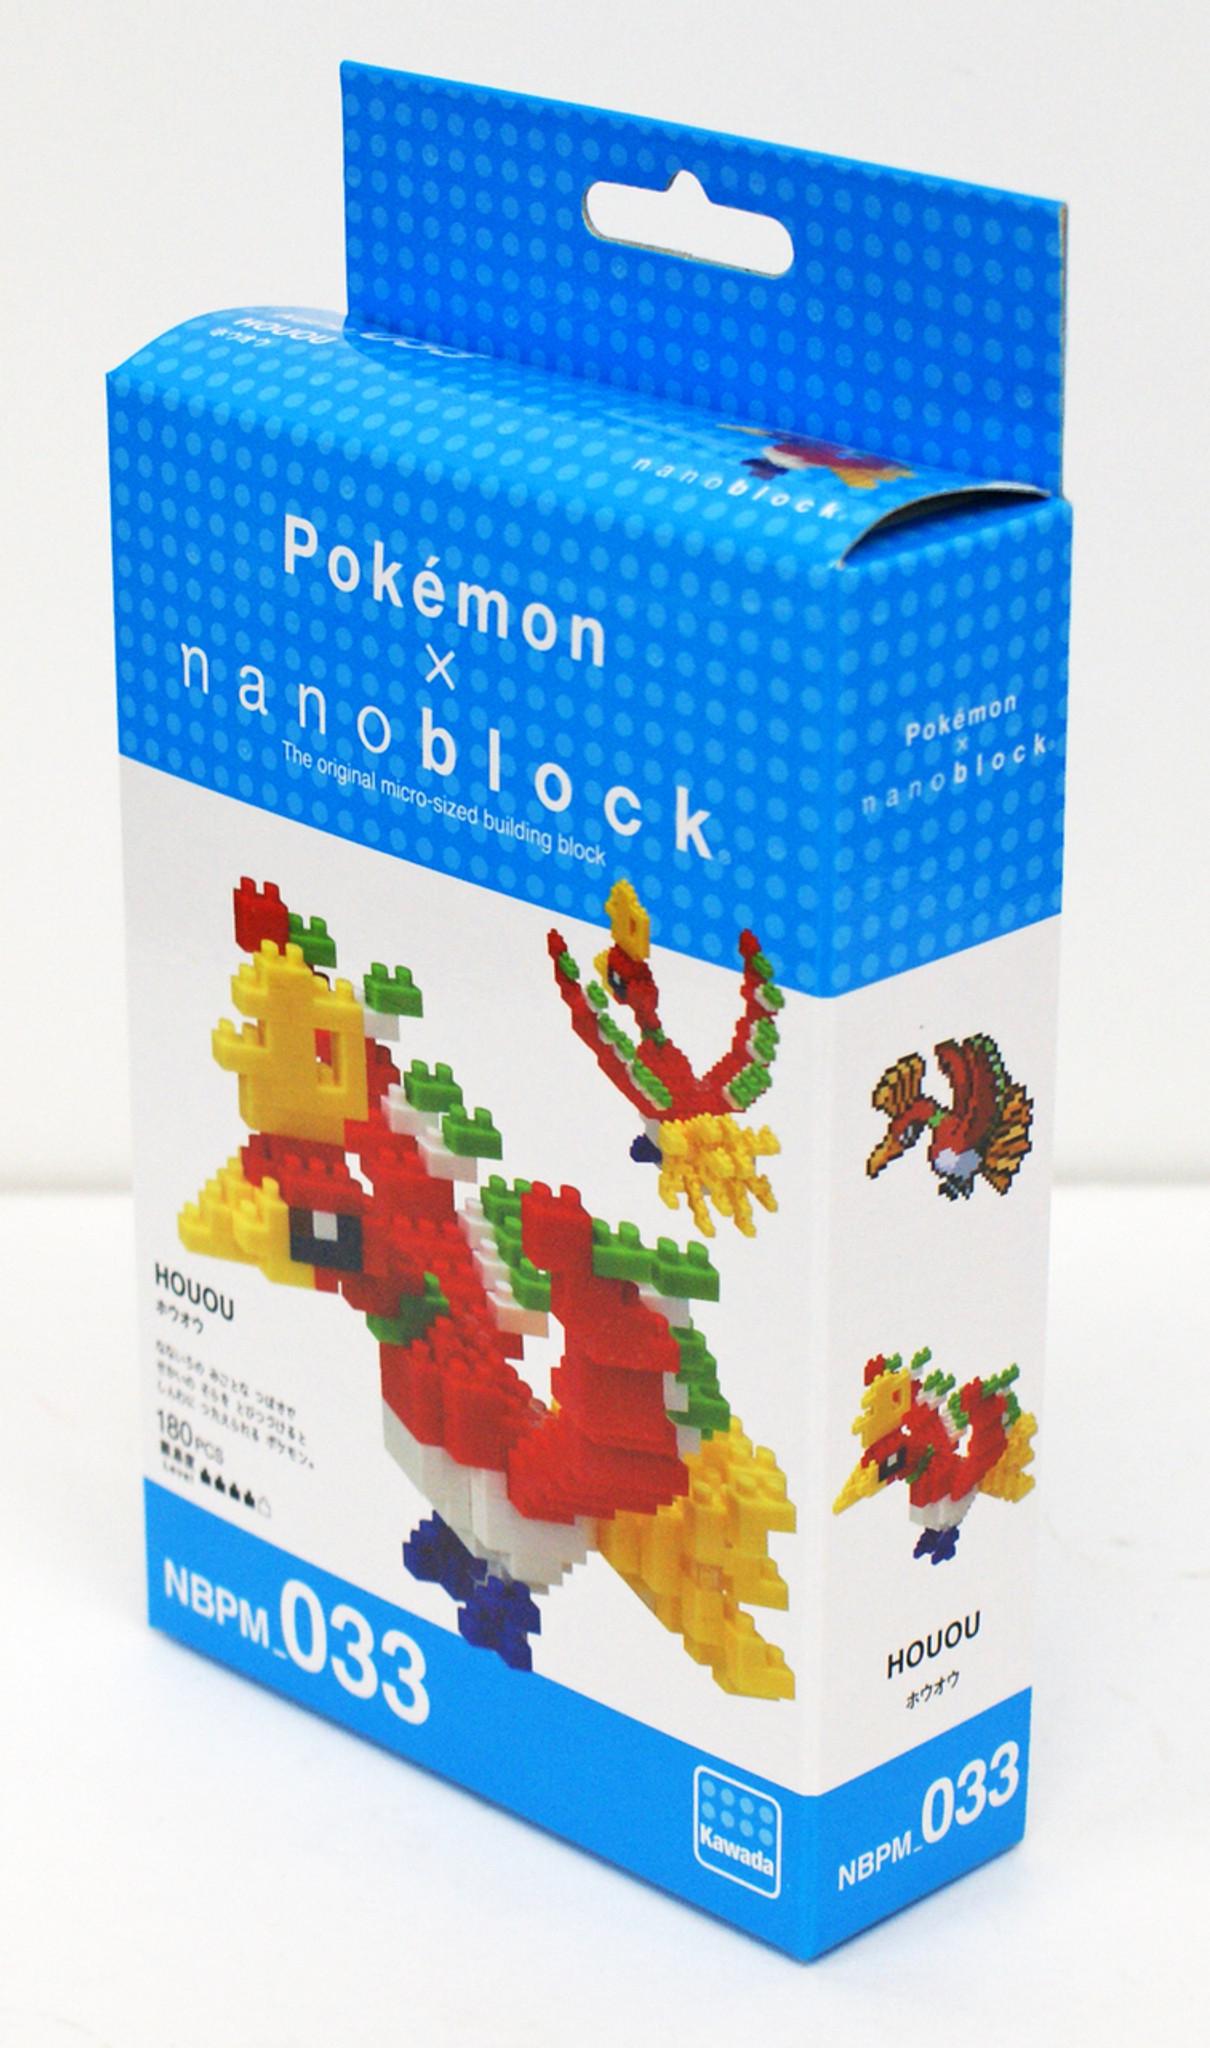 Nano-block Pokemon Ho-Oh NBPM/_033